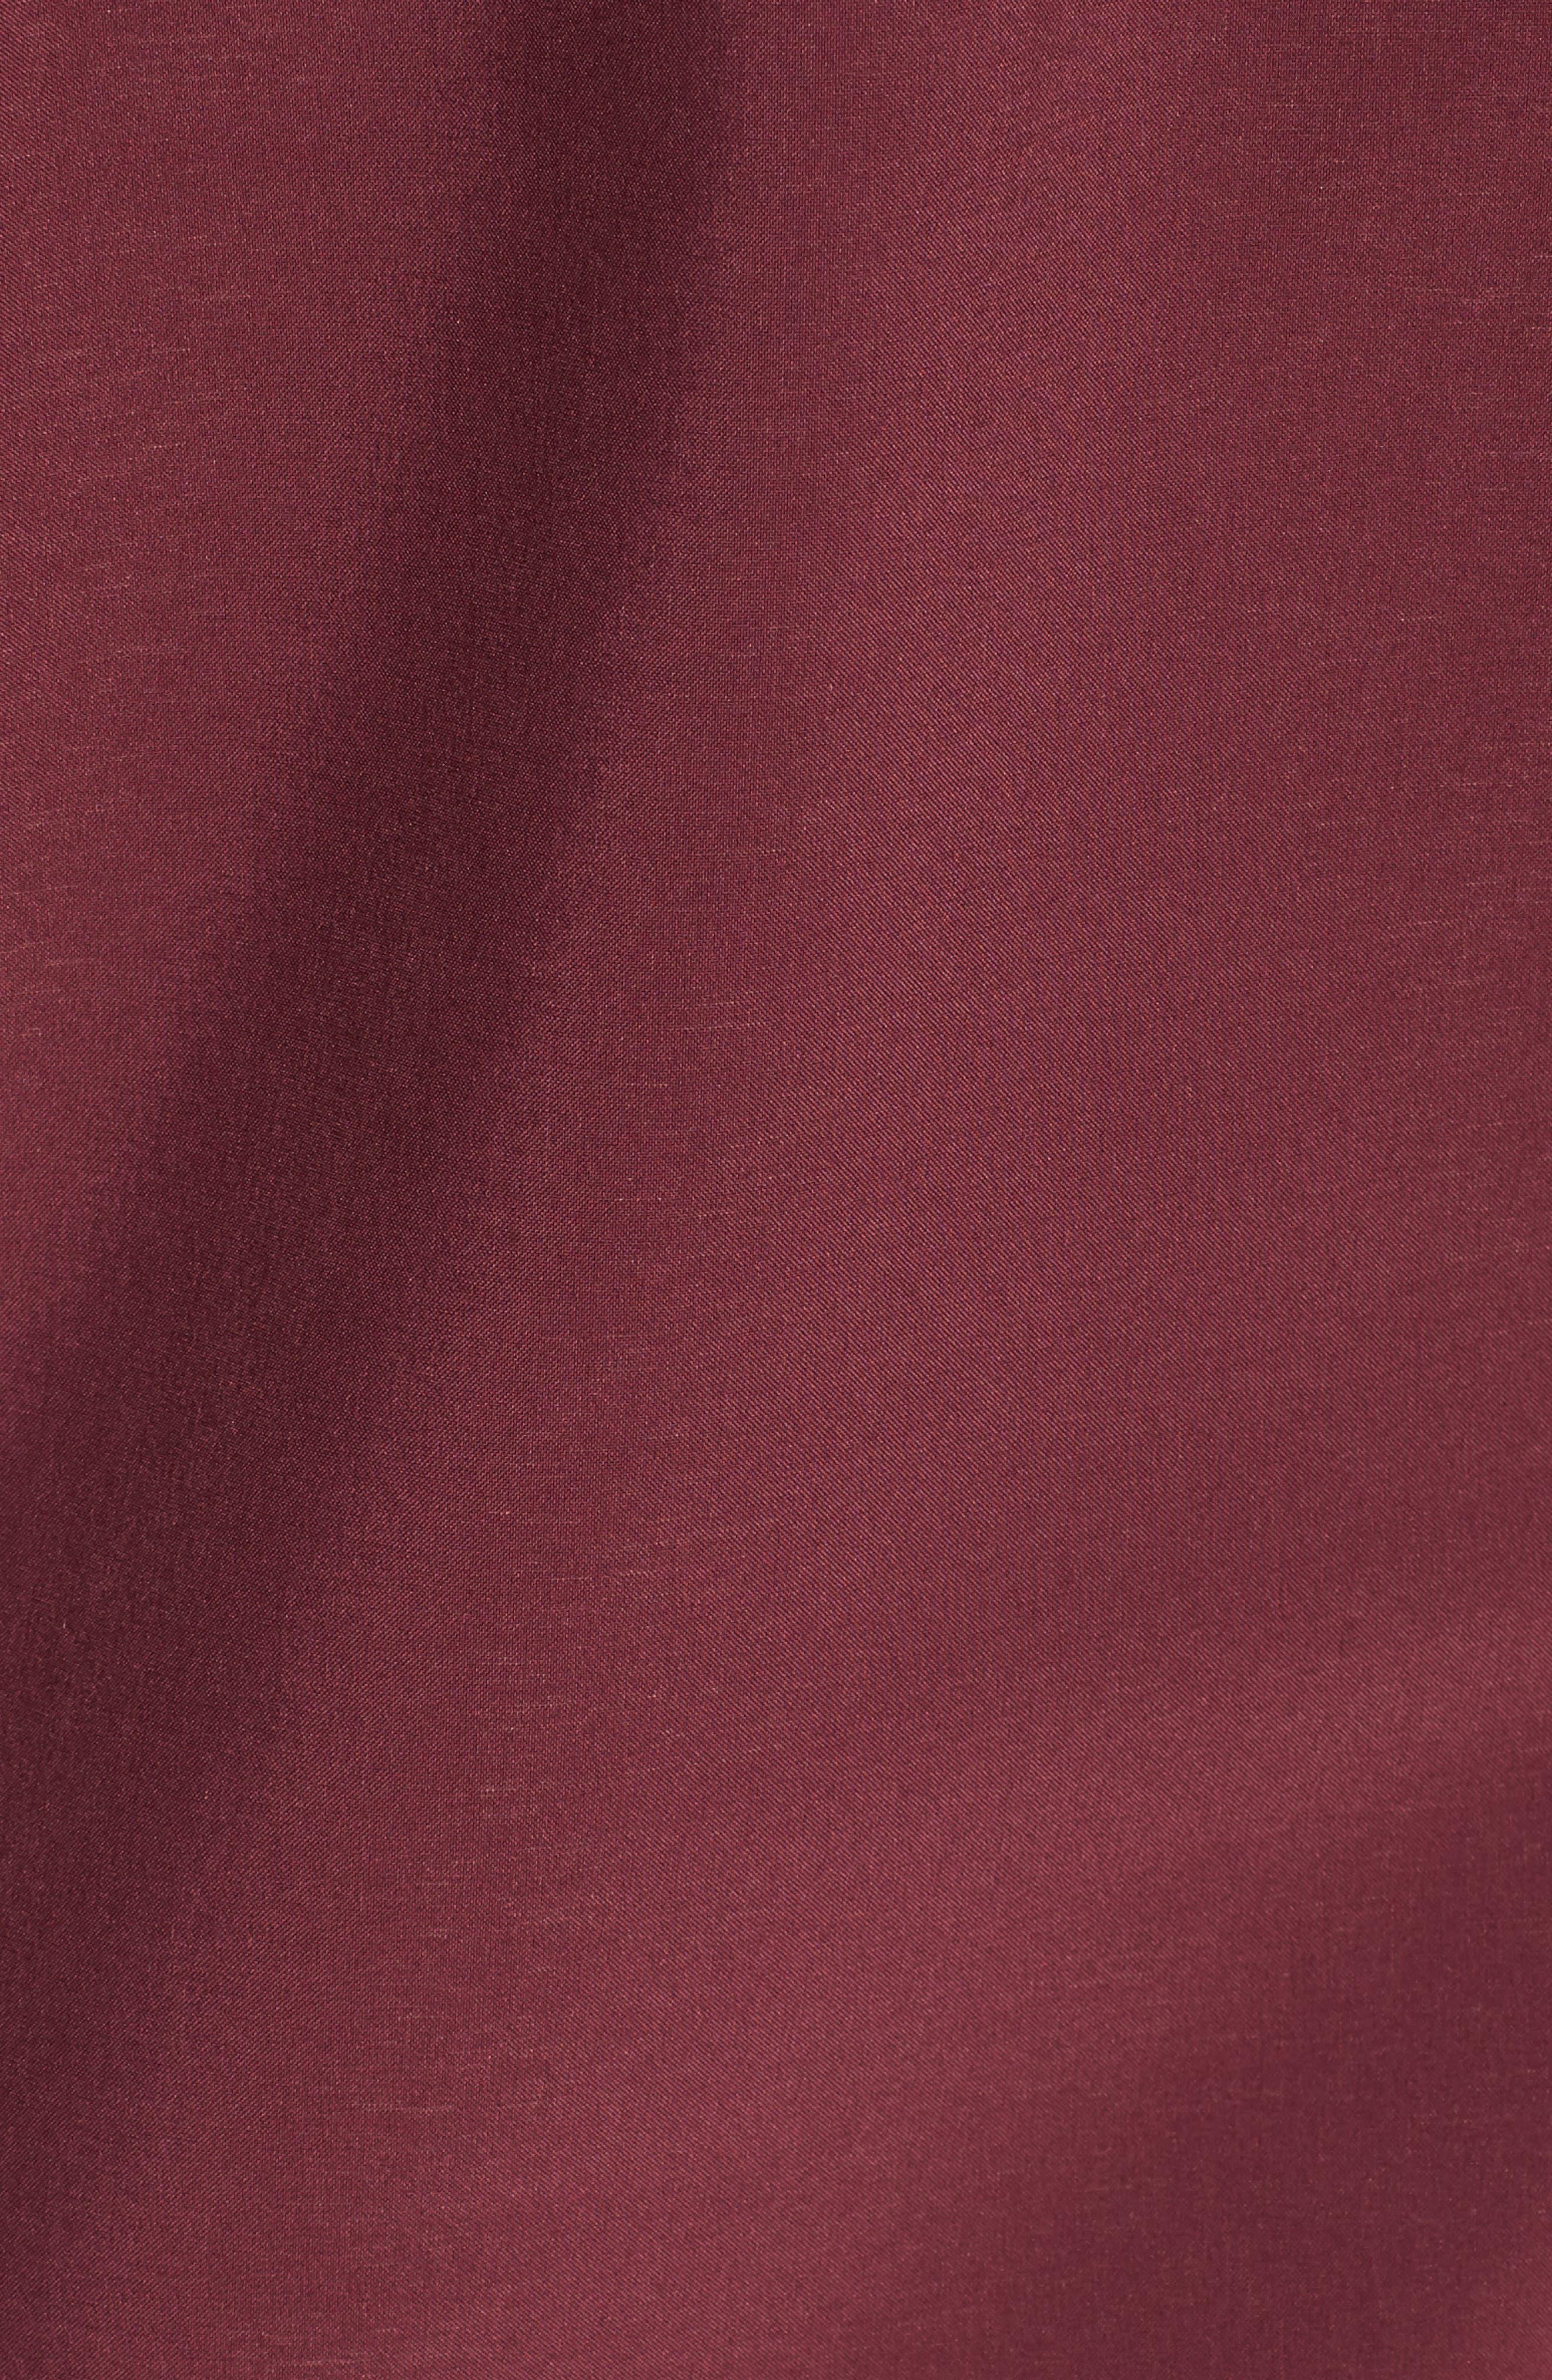 Apex Bionic Grace Jacket,                             Alternate thumbnail 7, color,                             FIG